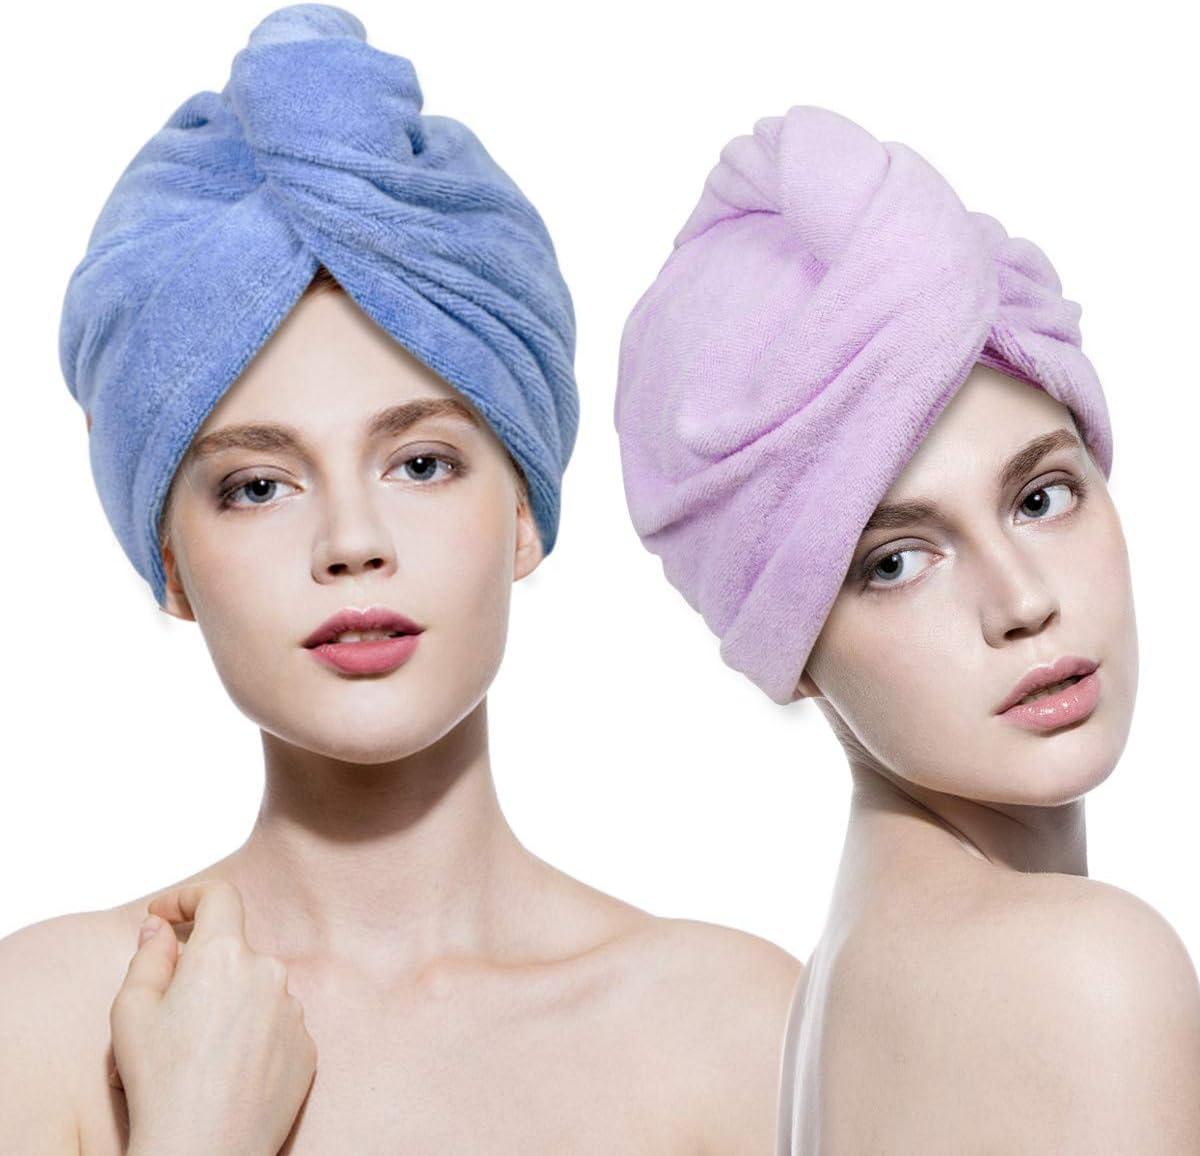 Wrap Quick Turban Magic Shower Dry Drying Hat Cap Microfiber Bathing Towel Hair